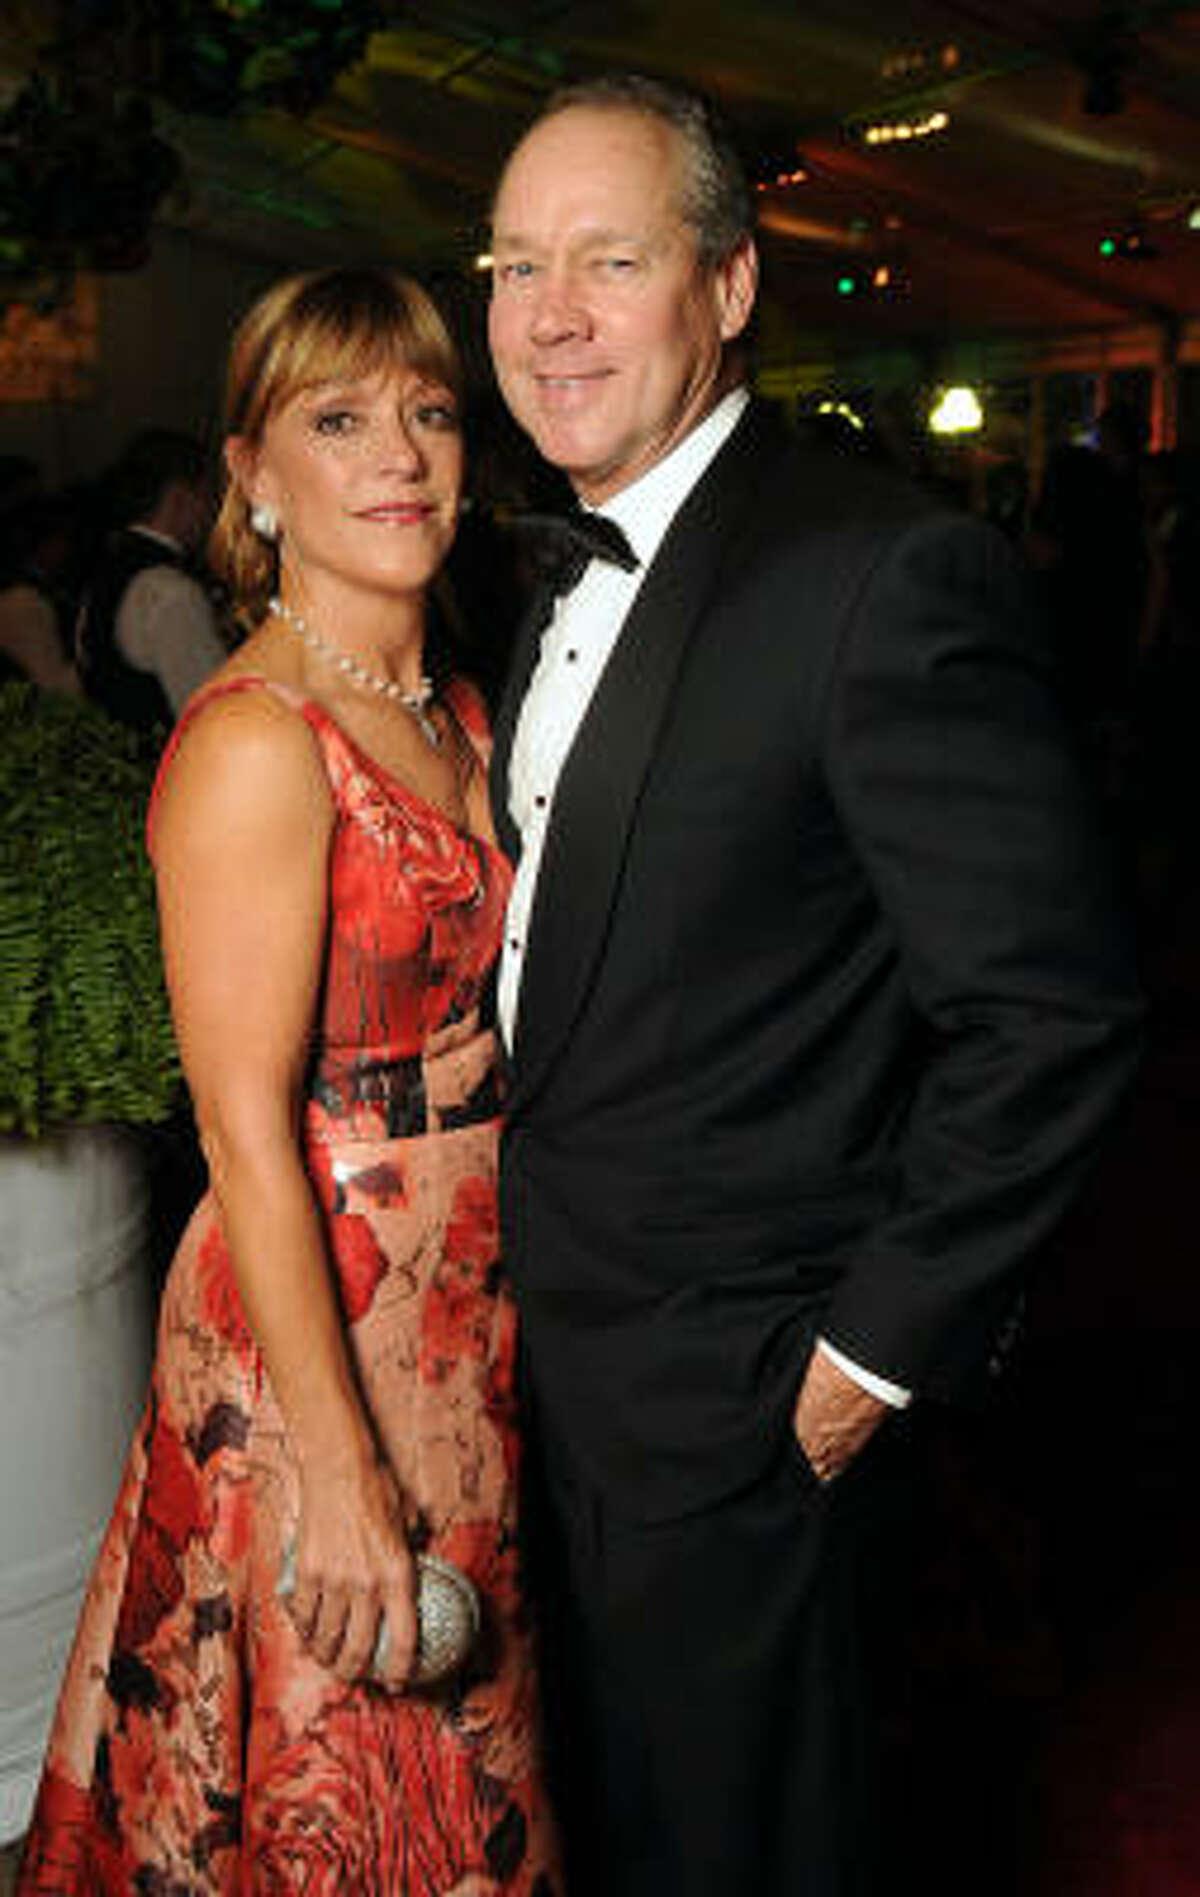 Franci and Jim Crane seen at the Houston Grand Opera's 2010-2011 season opener.